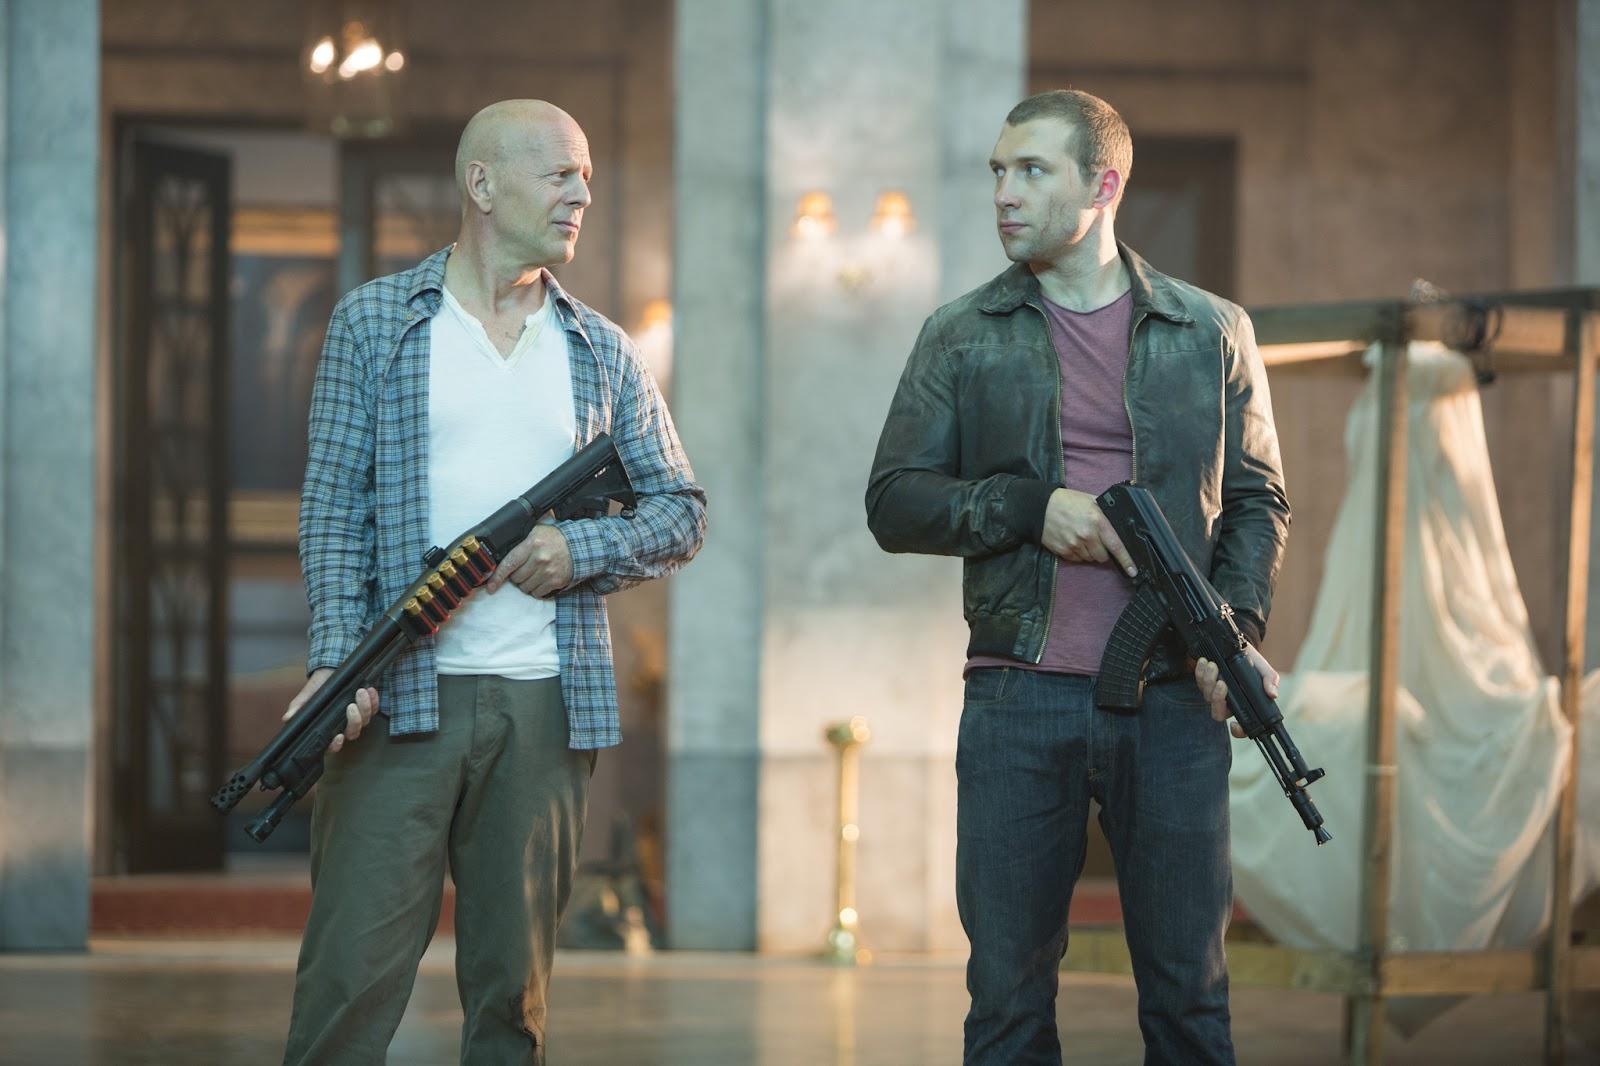 John McClane (Bruce Willis) and John McClane Jnr (Jai Courtney) team up in A Good Day to Die Hard